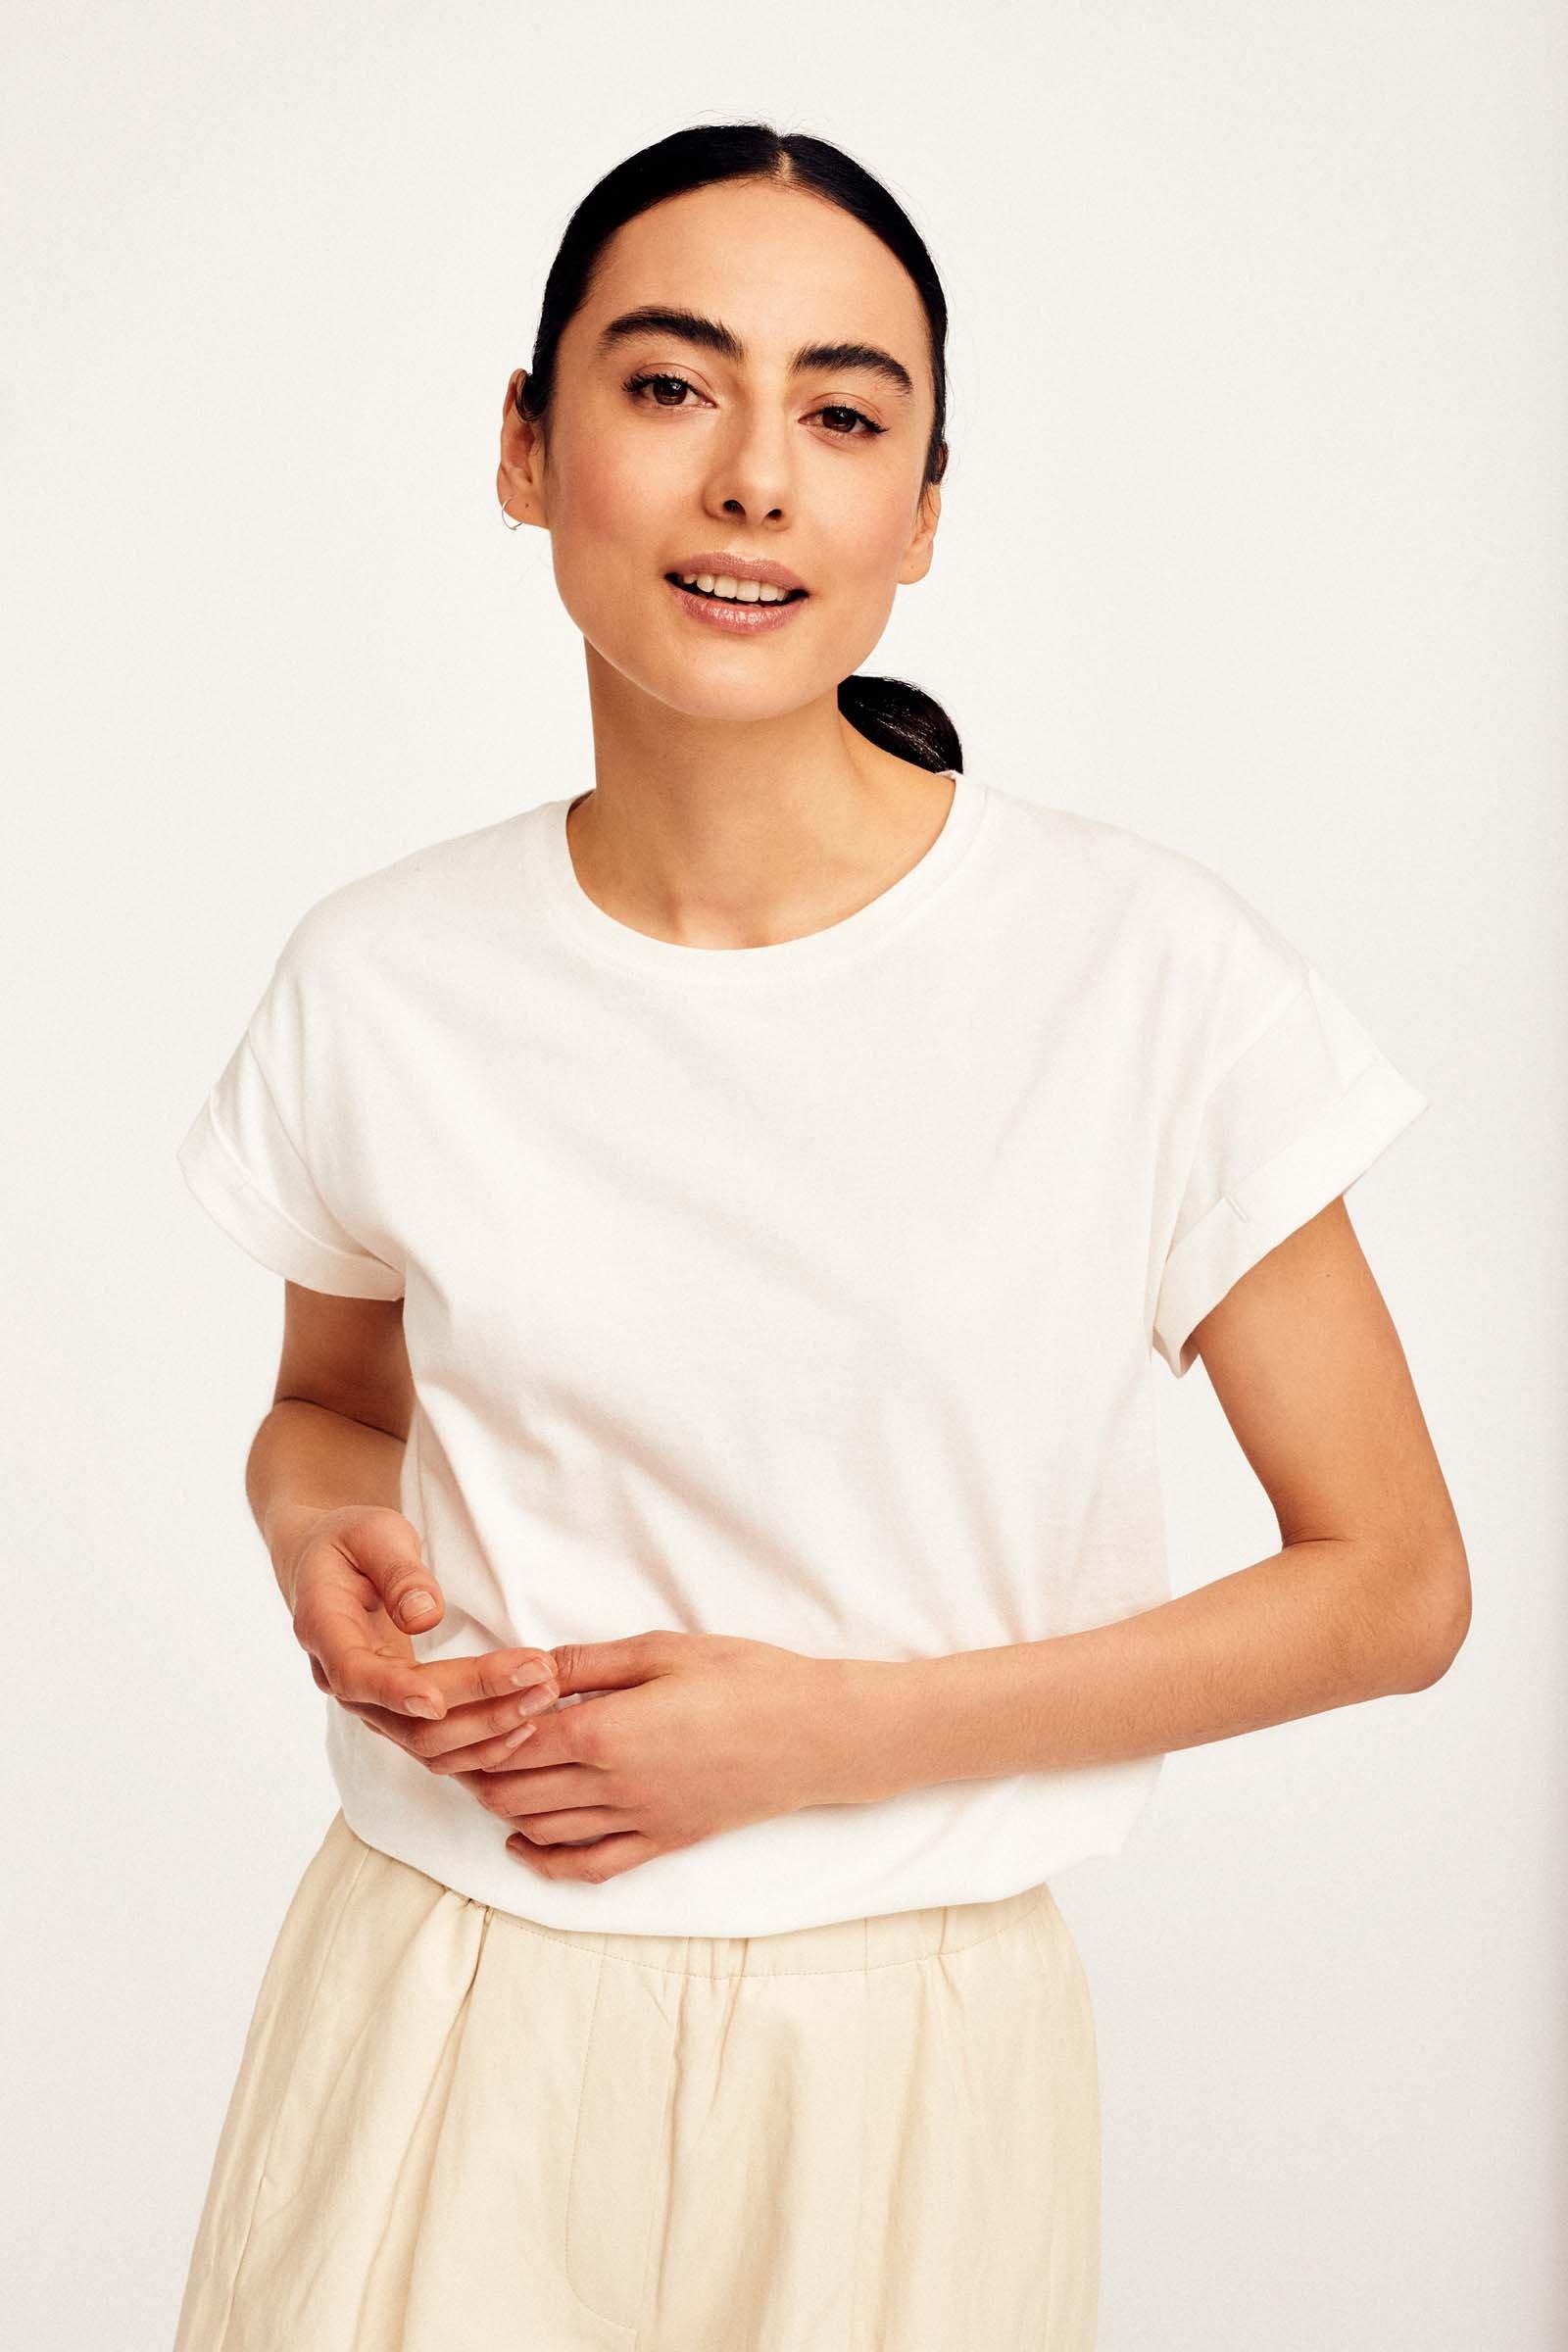 CKS Dames - JUNA - t-shirt korte mouwen - lichtbruin